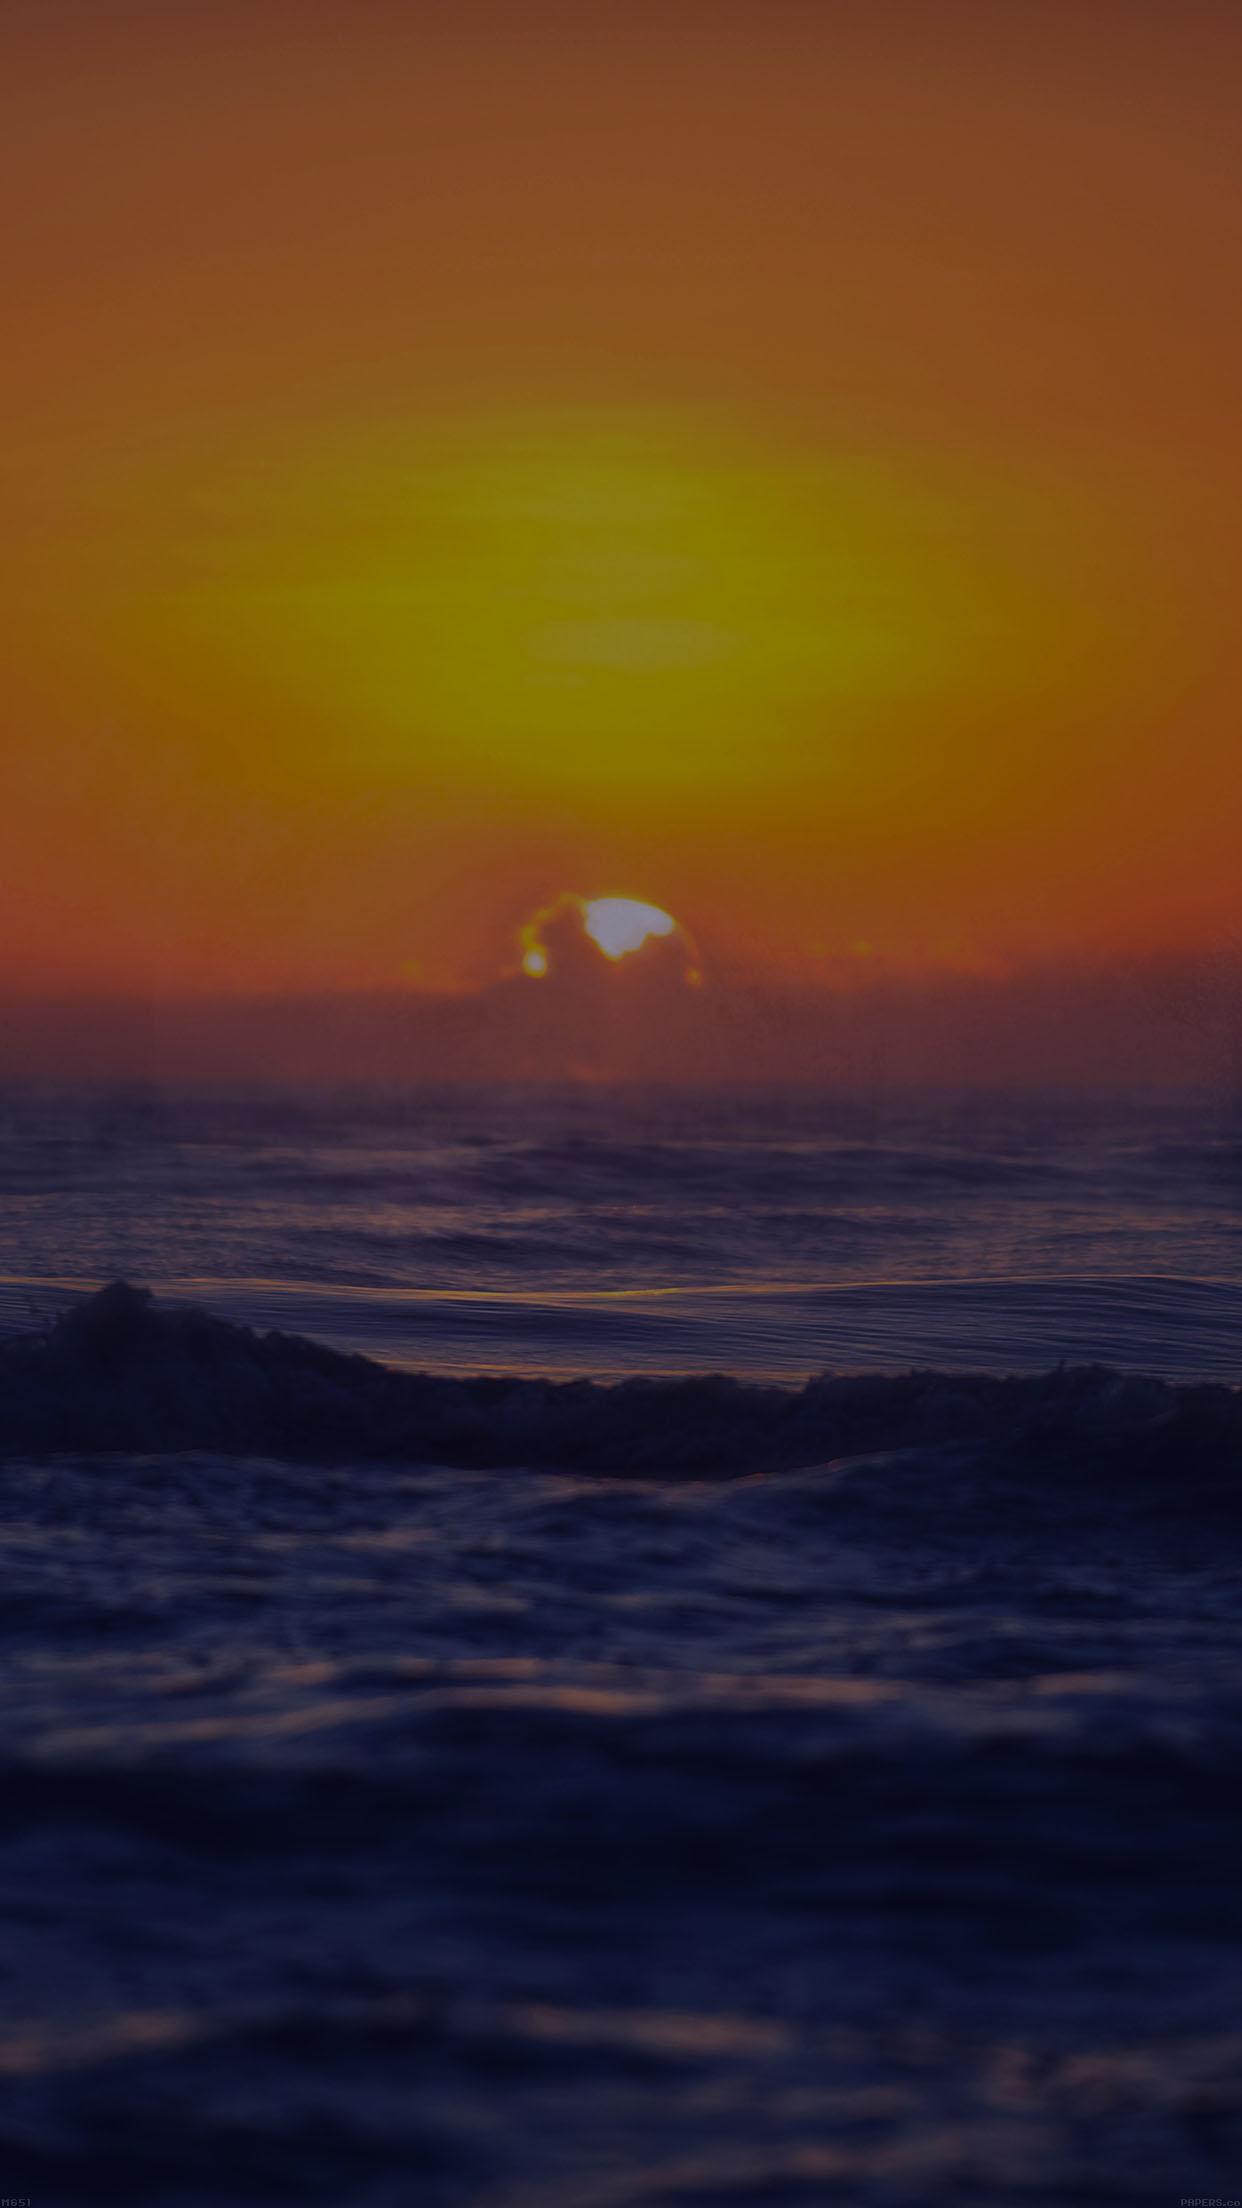 Disney Iphone 6 Wallpaper Mg51 Sea Spray Dark Sunset Ocean Water Nature Papers Co